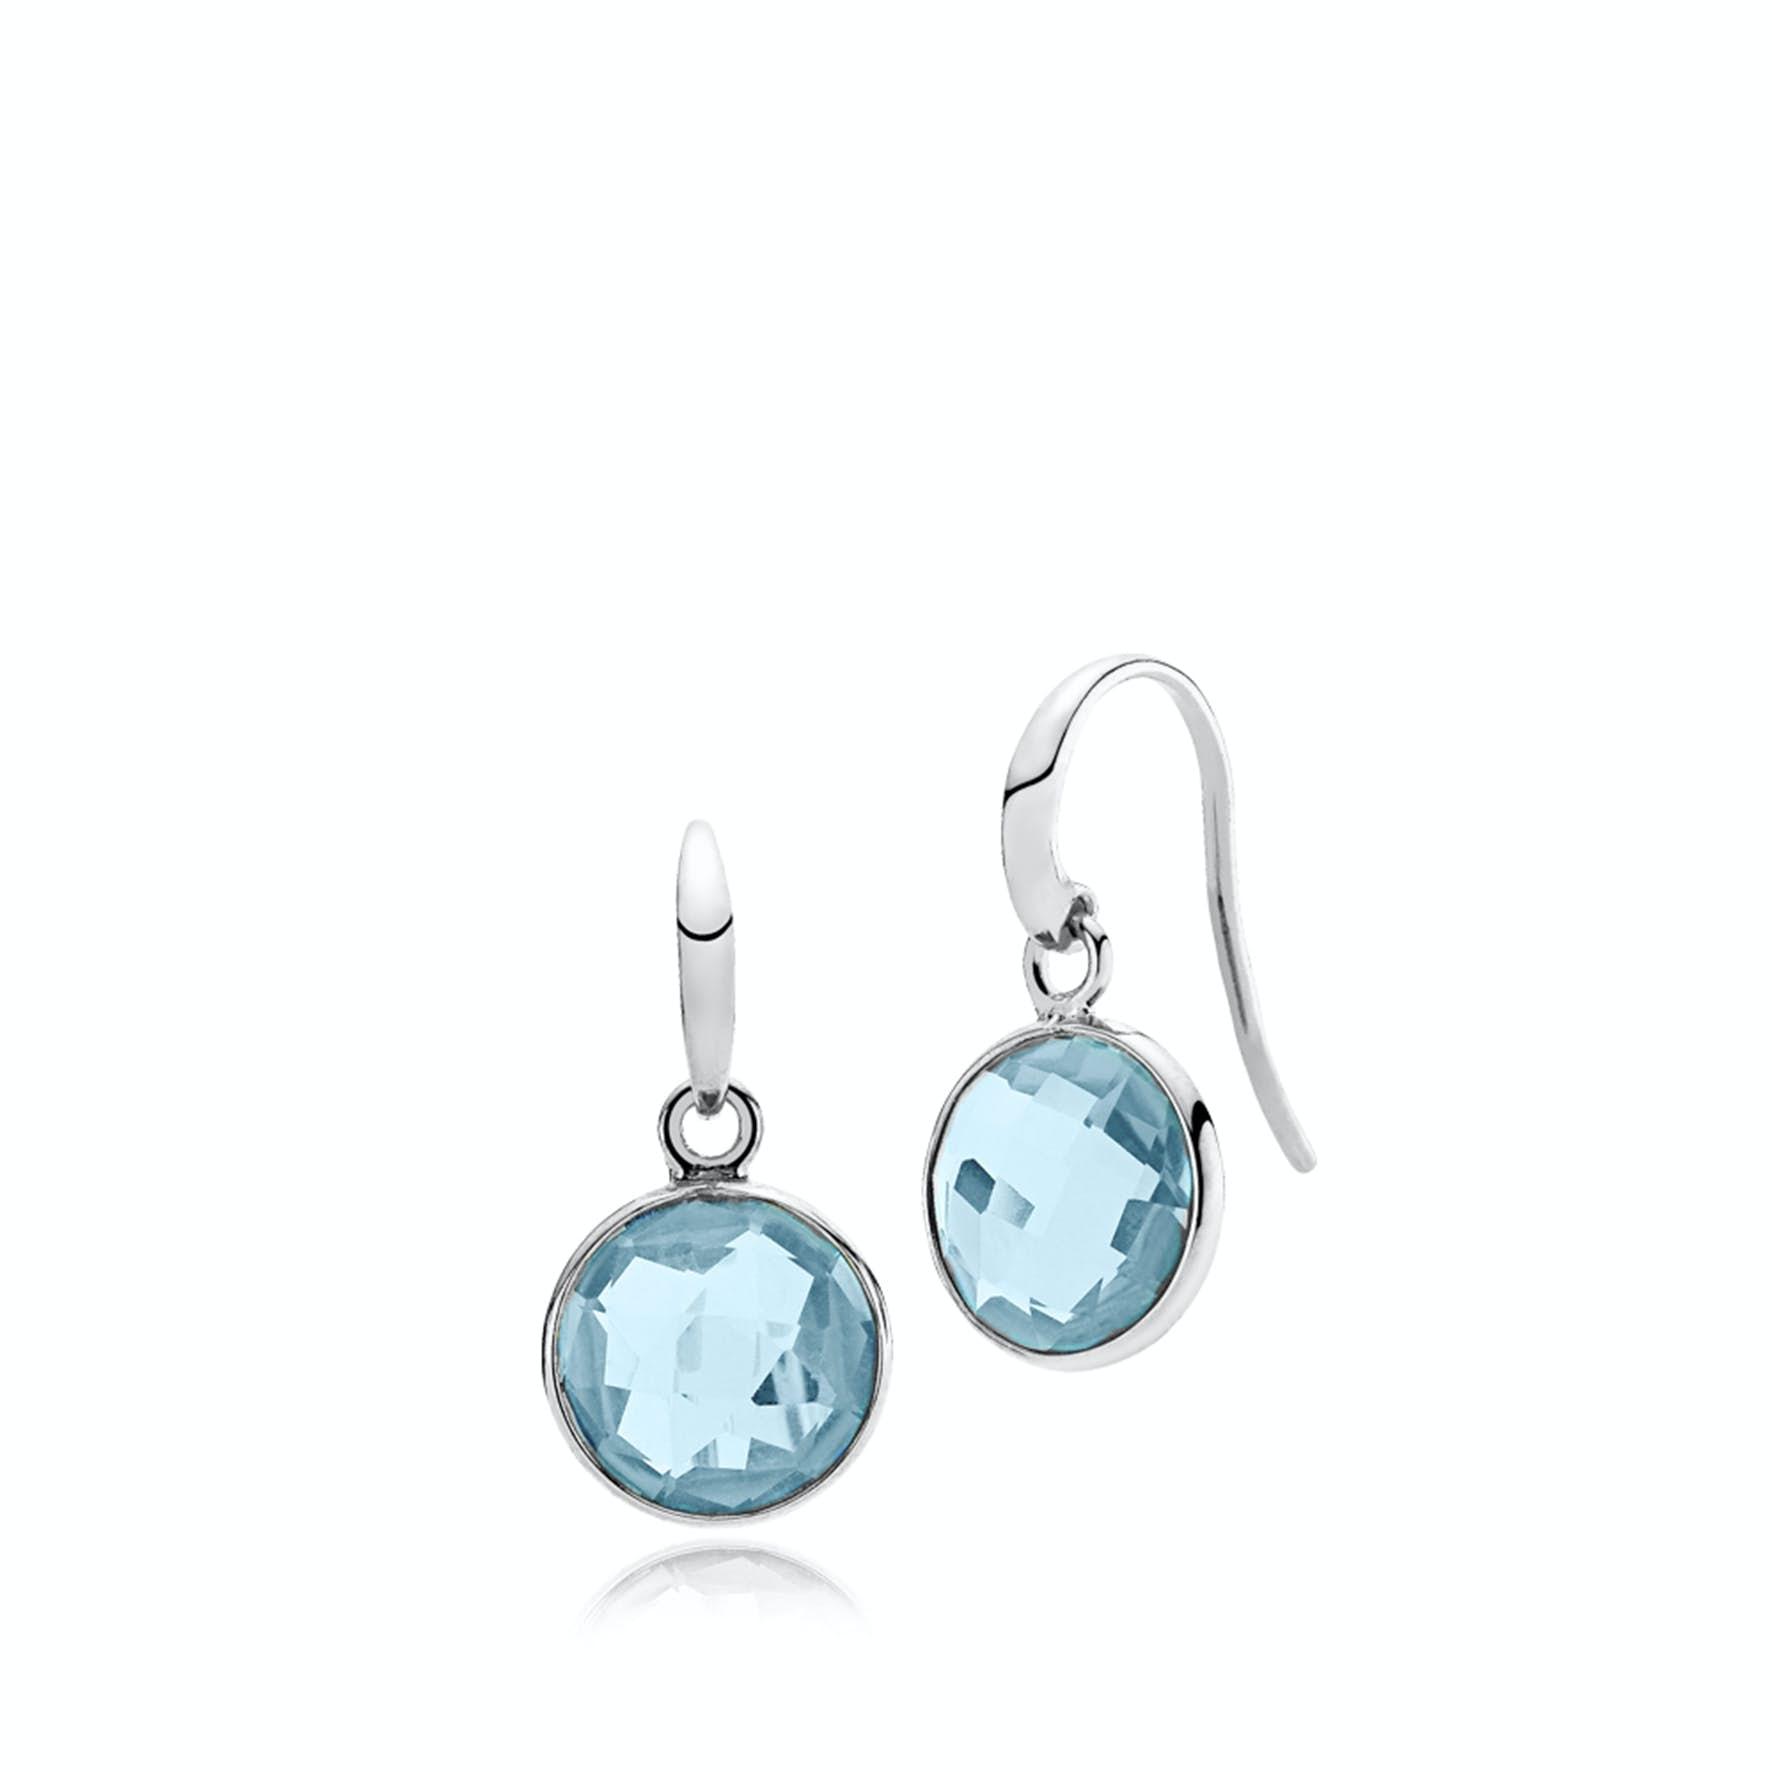 Prima Donna Earrings Aqua Blue fra Izabel Camille i Sølv Sterling 925 Aqua Blue